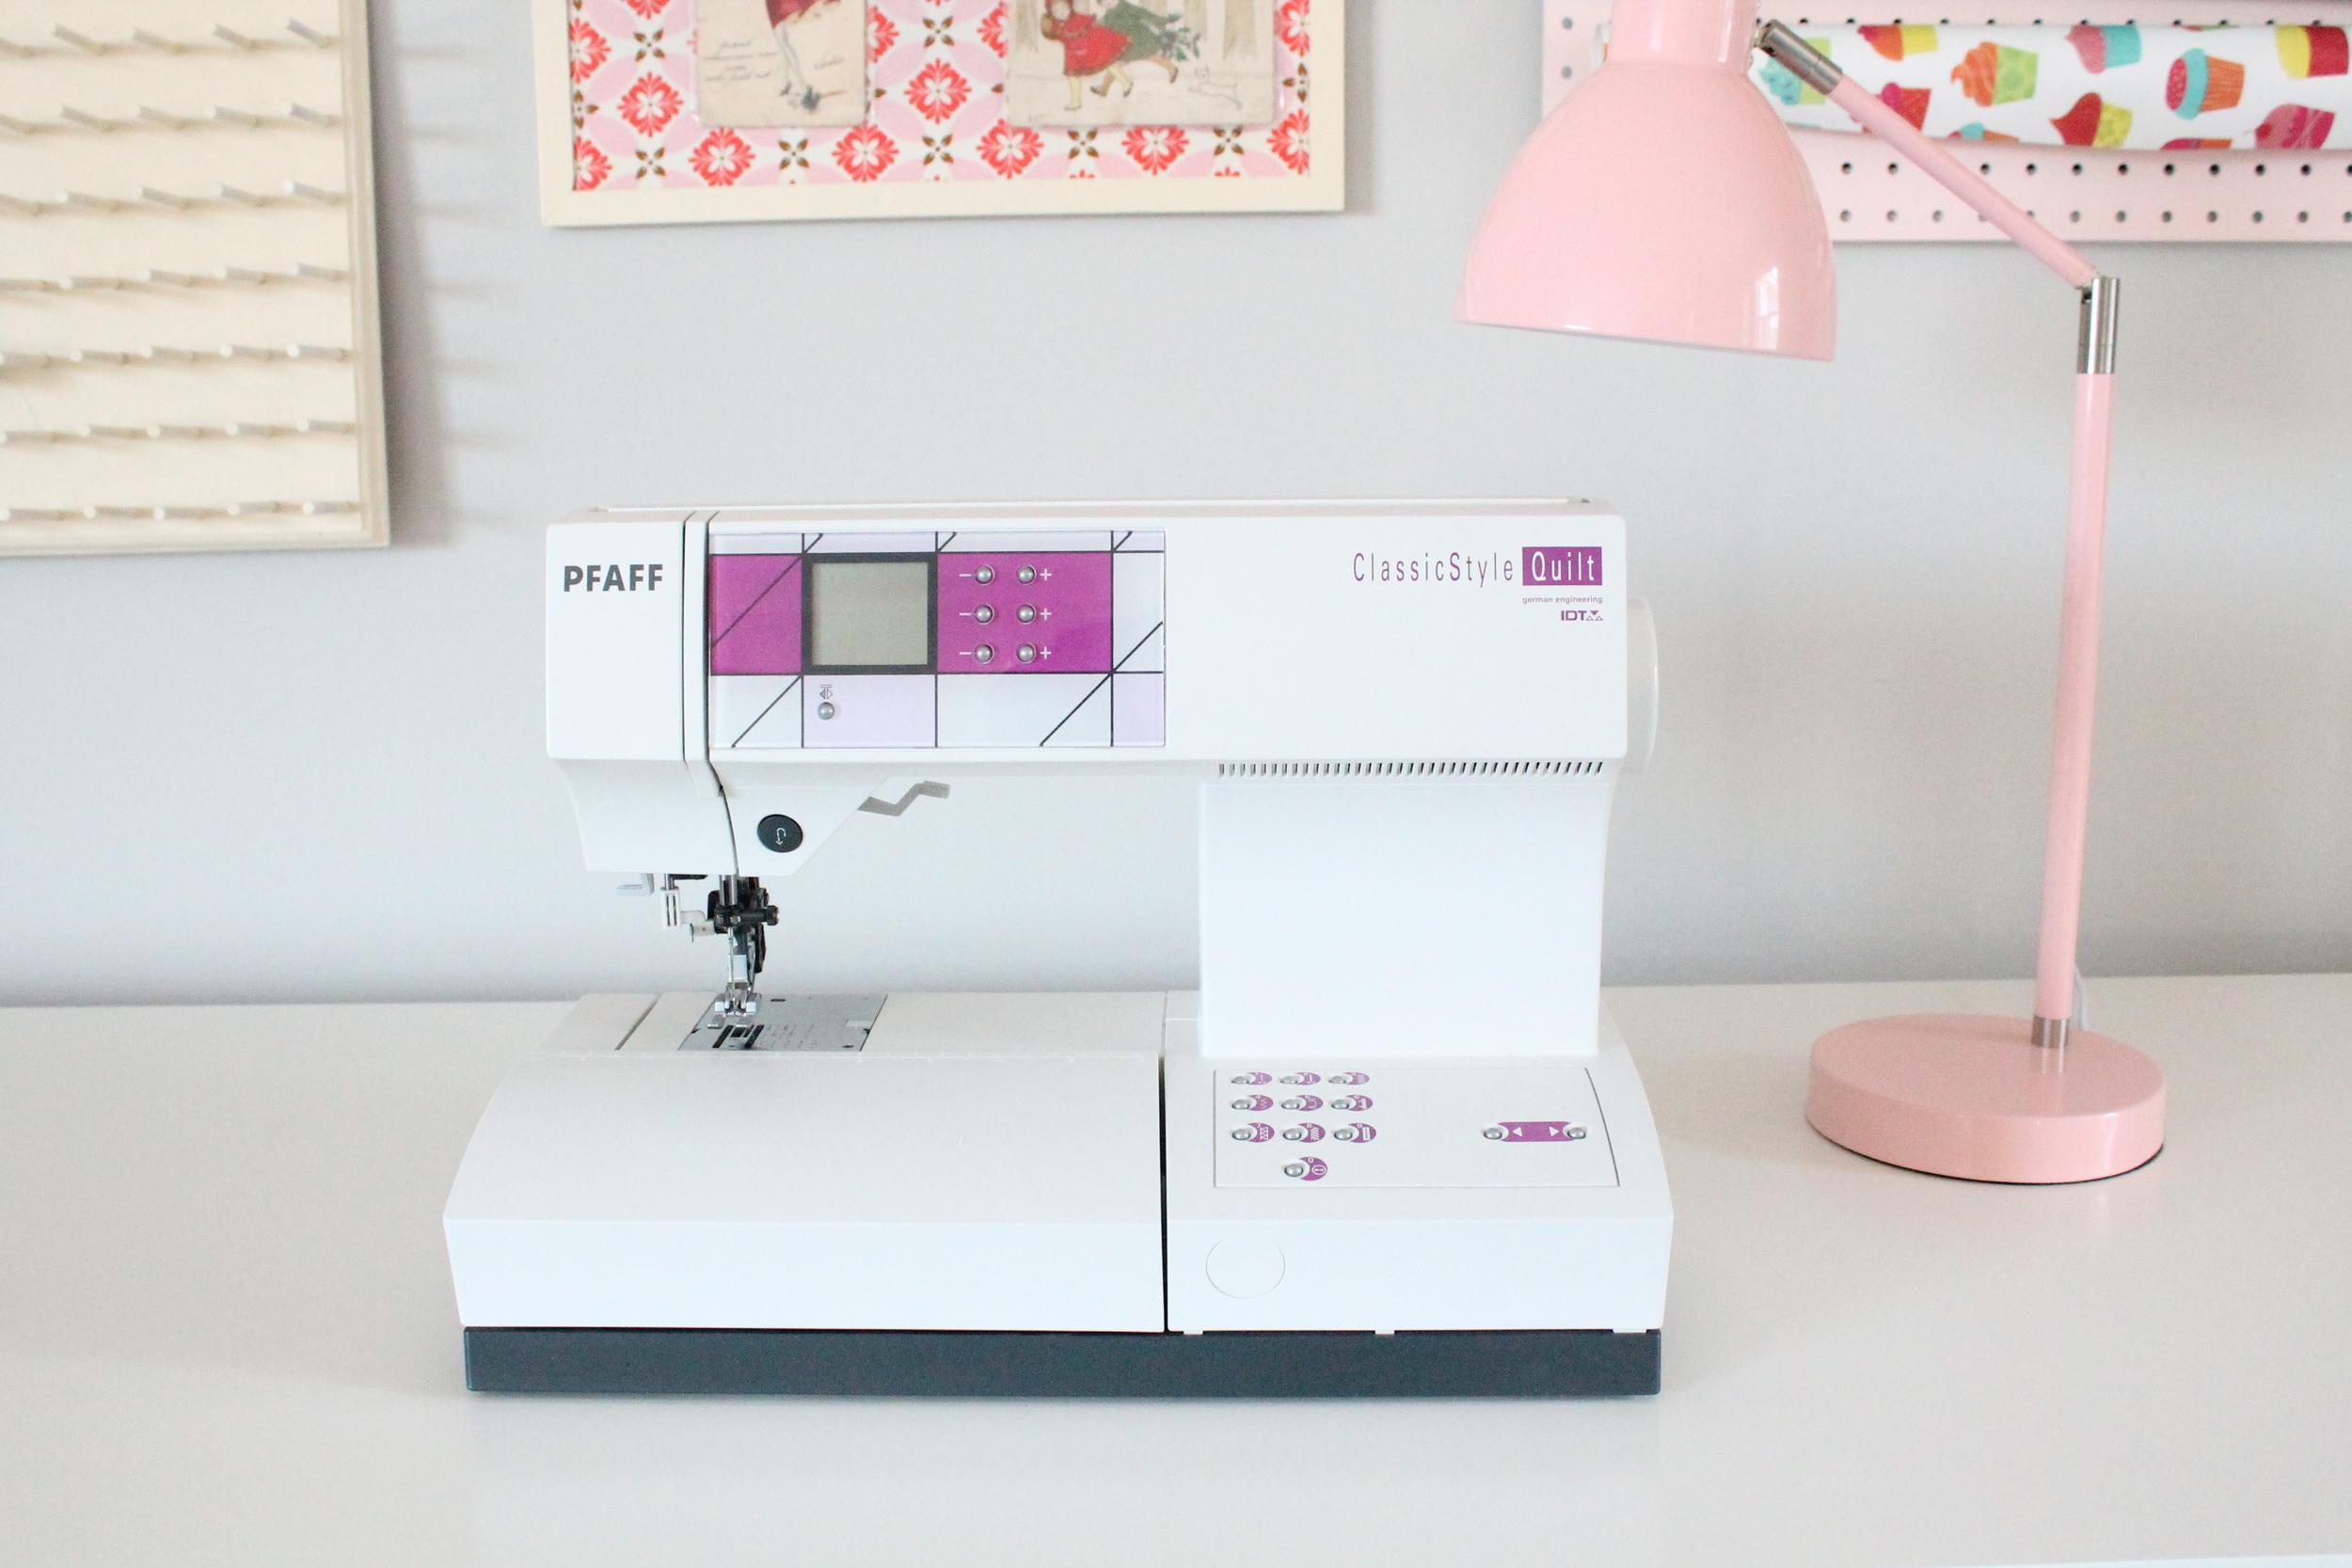 Pfaff sewing machine in Tessie Fay's family craft studio.